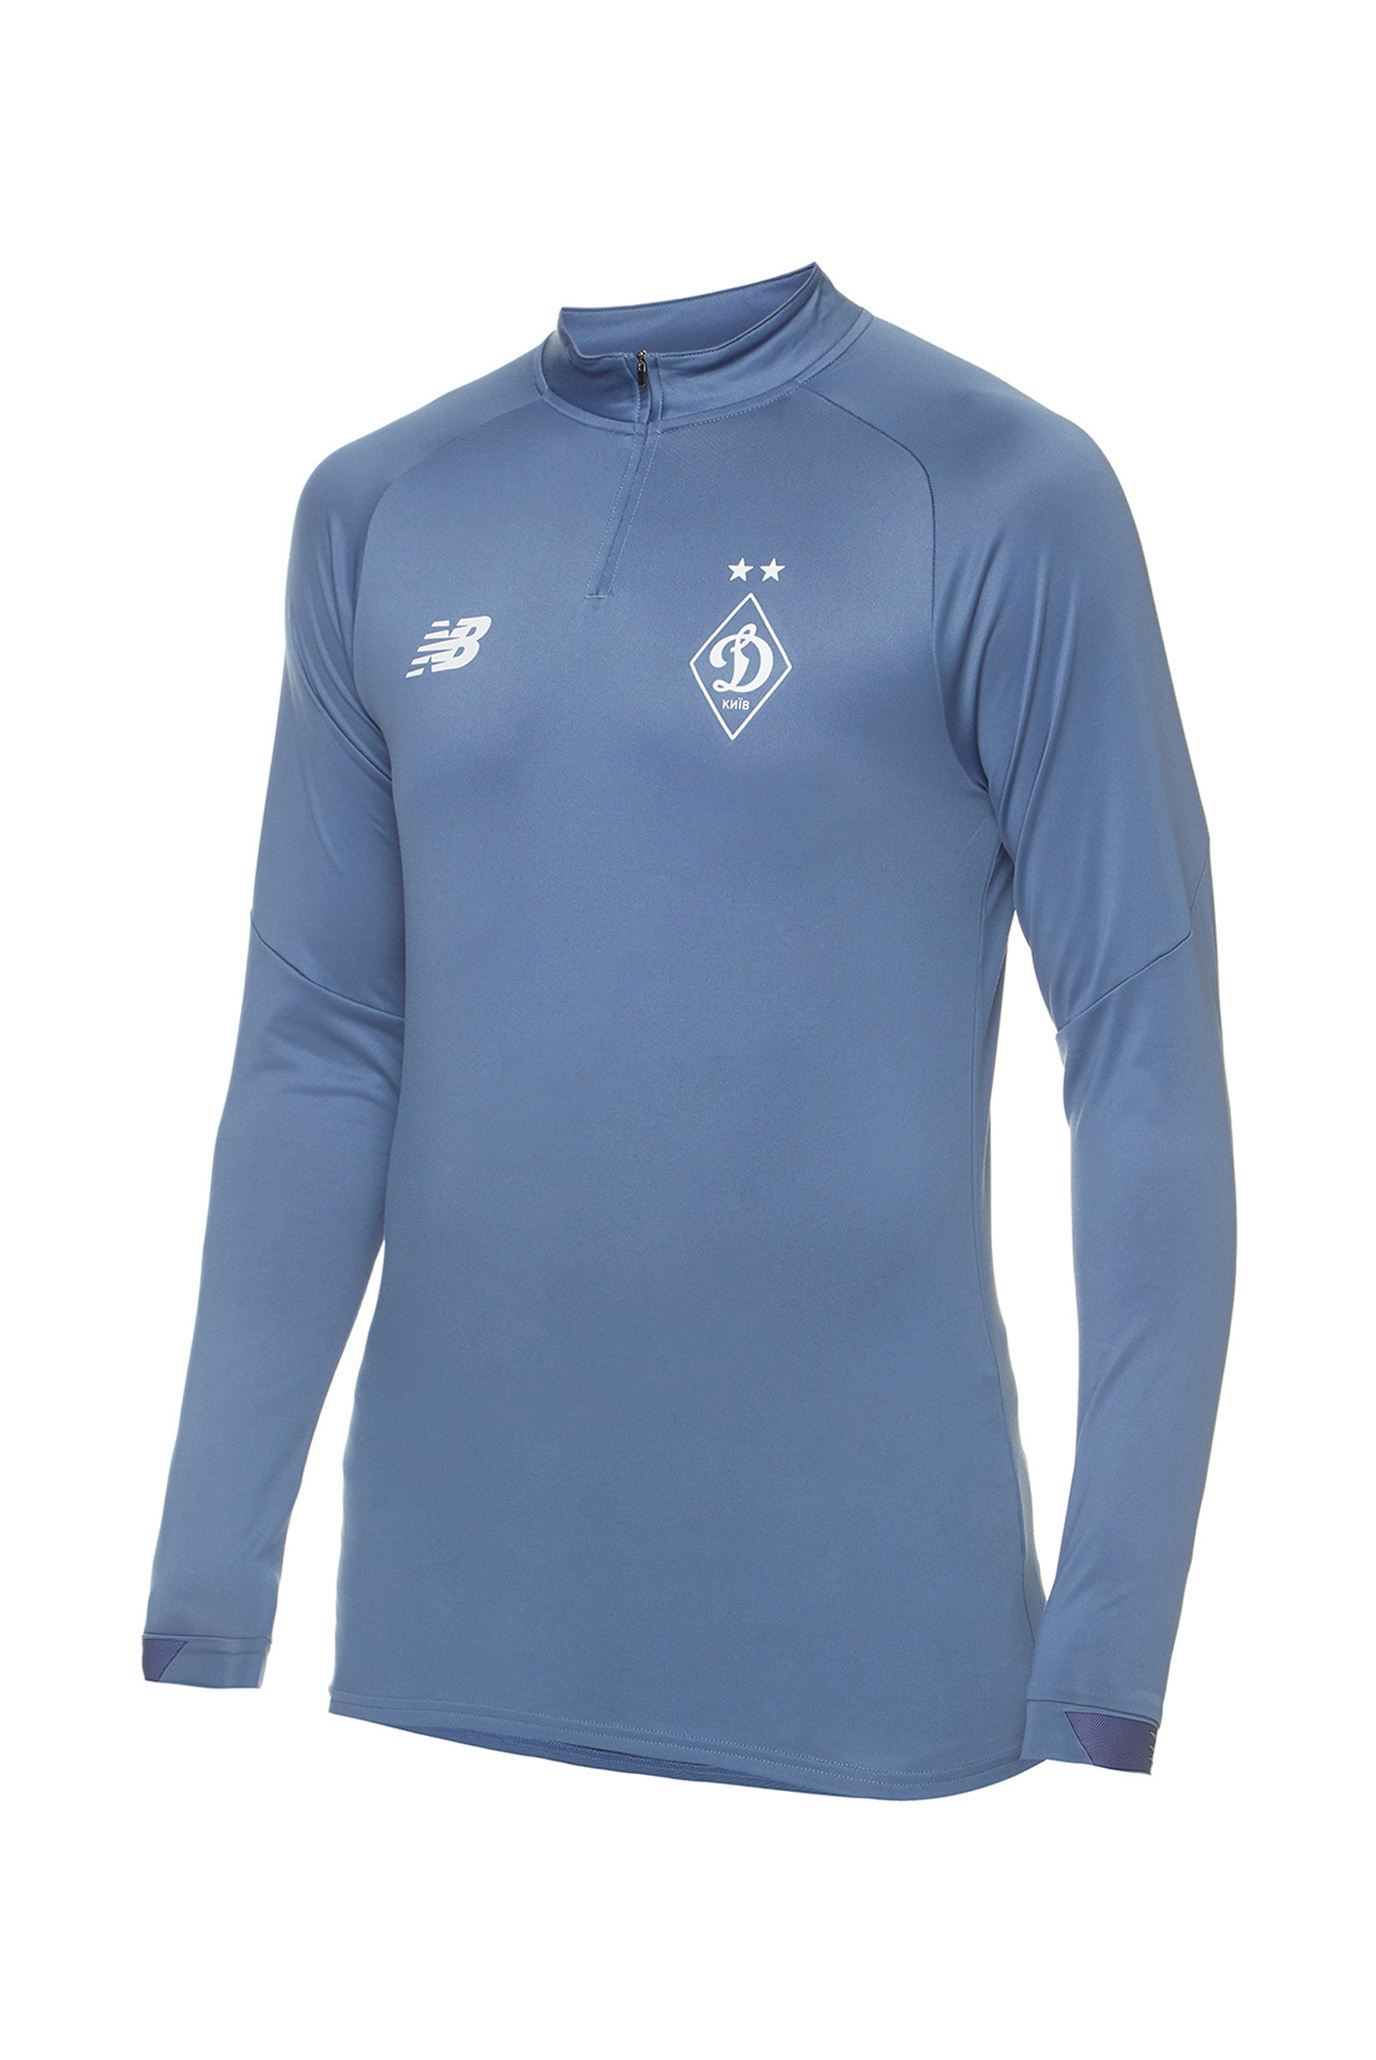 Чоловіча синя спортивна кофта ФК «Динамо» Київ Base 1